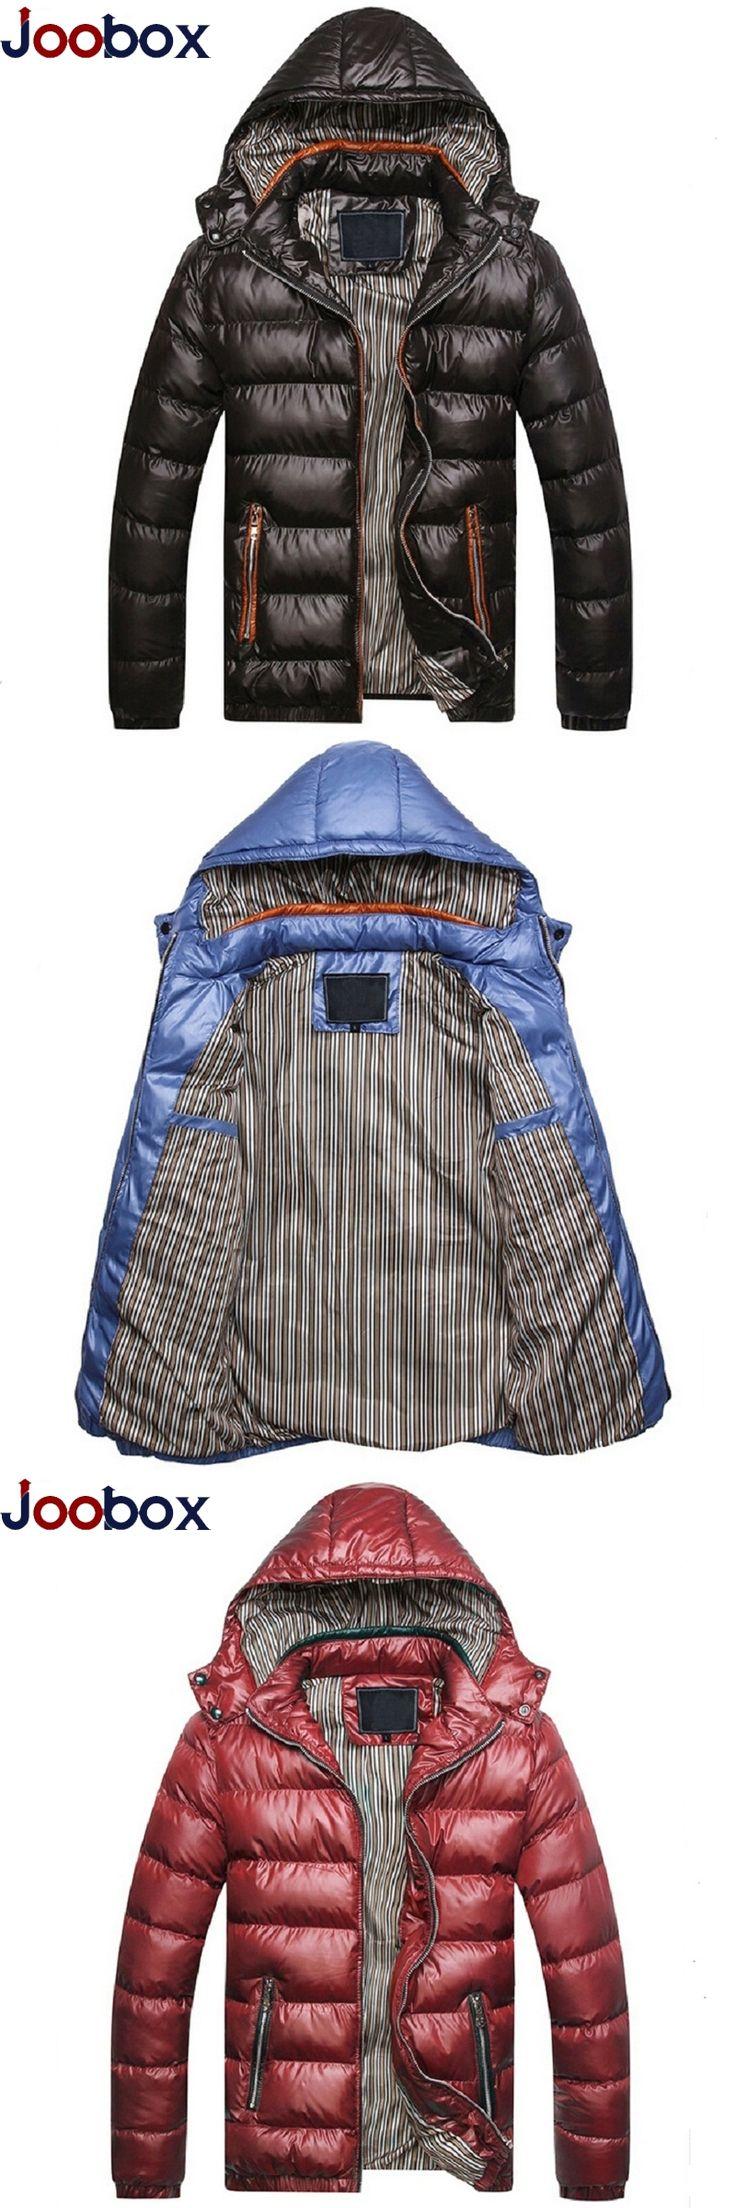 JOOBOX New 2017 Men Winter Jacket Fashion Hooded Thermal Down parka hombre Jacket coats Plus Size 3XL Chaquetas Plumas Hombre